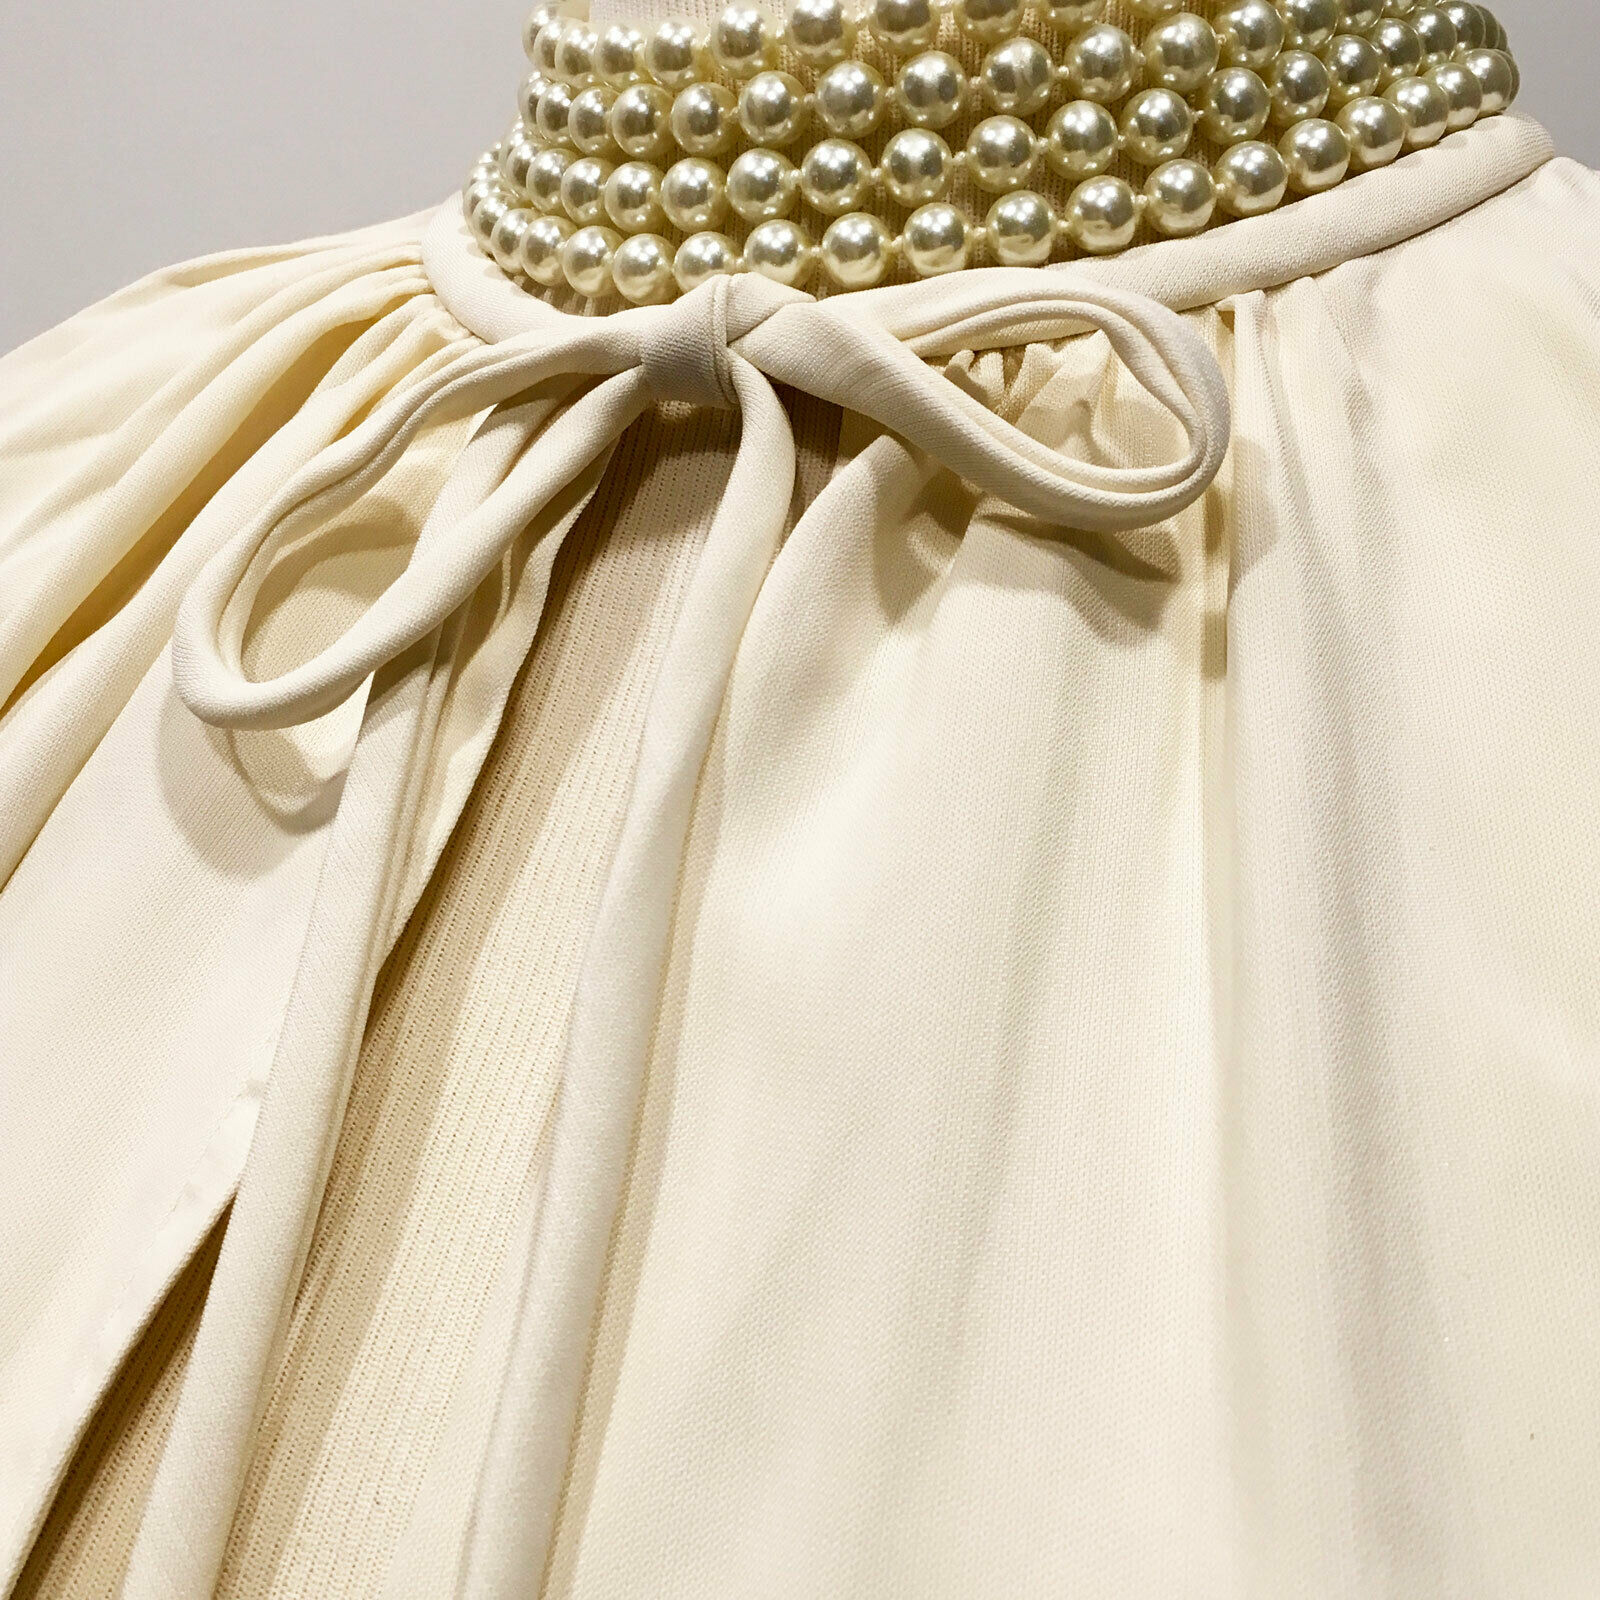 Balenciaga | $945 Ivory One-Shoulder  Pleated Dra… - image 3